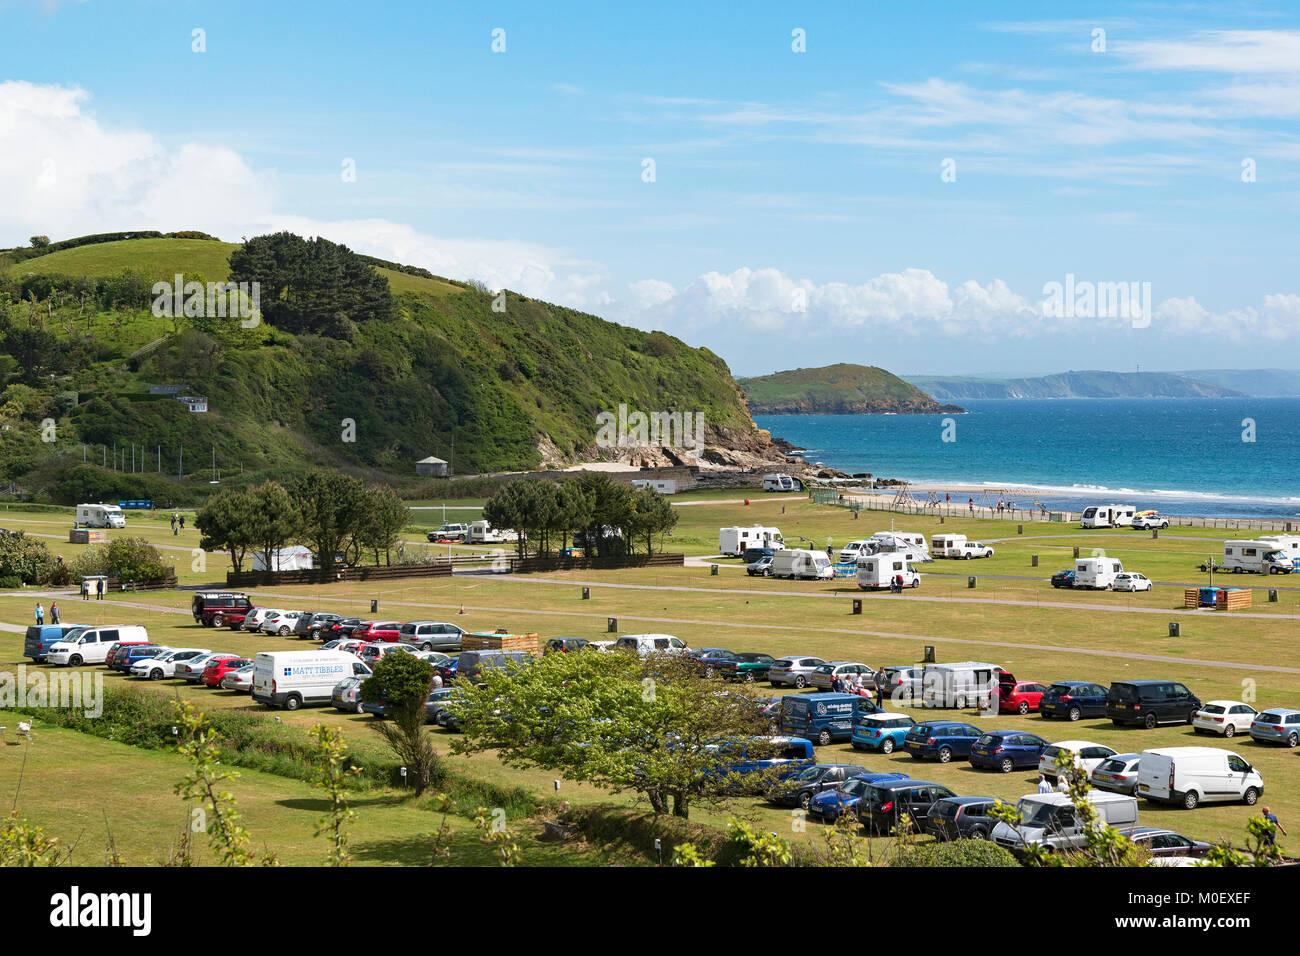 pentewan sands holiday caravan and camping park near mevagissey in cornwall, england, britain, uk. - Stock Image